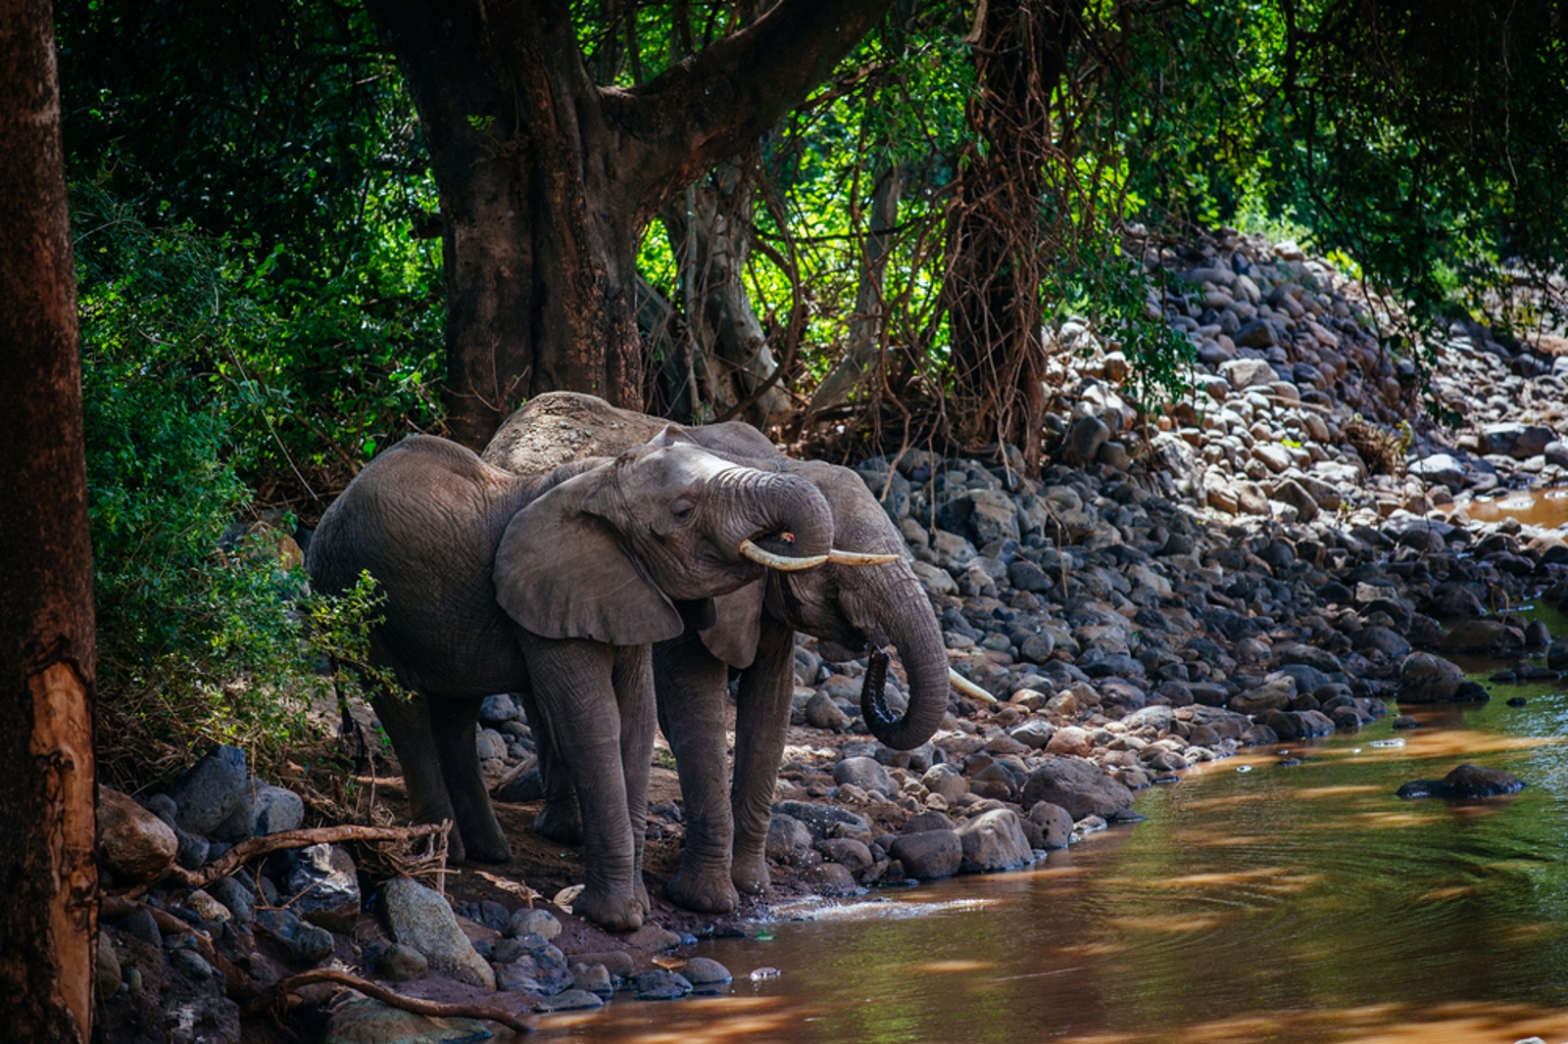 African Forest Elephant Loxodonta cyclotis